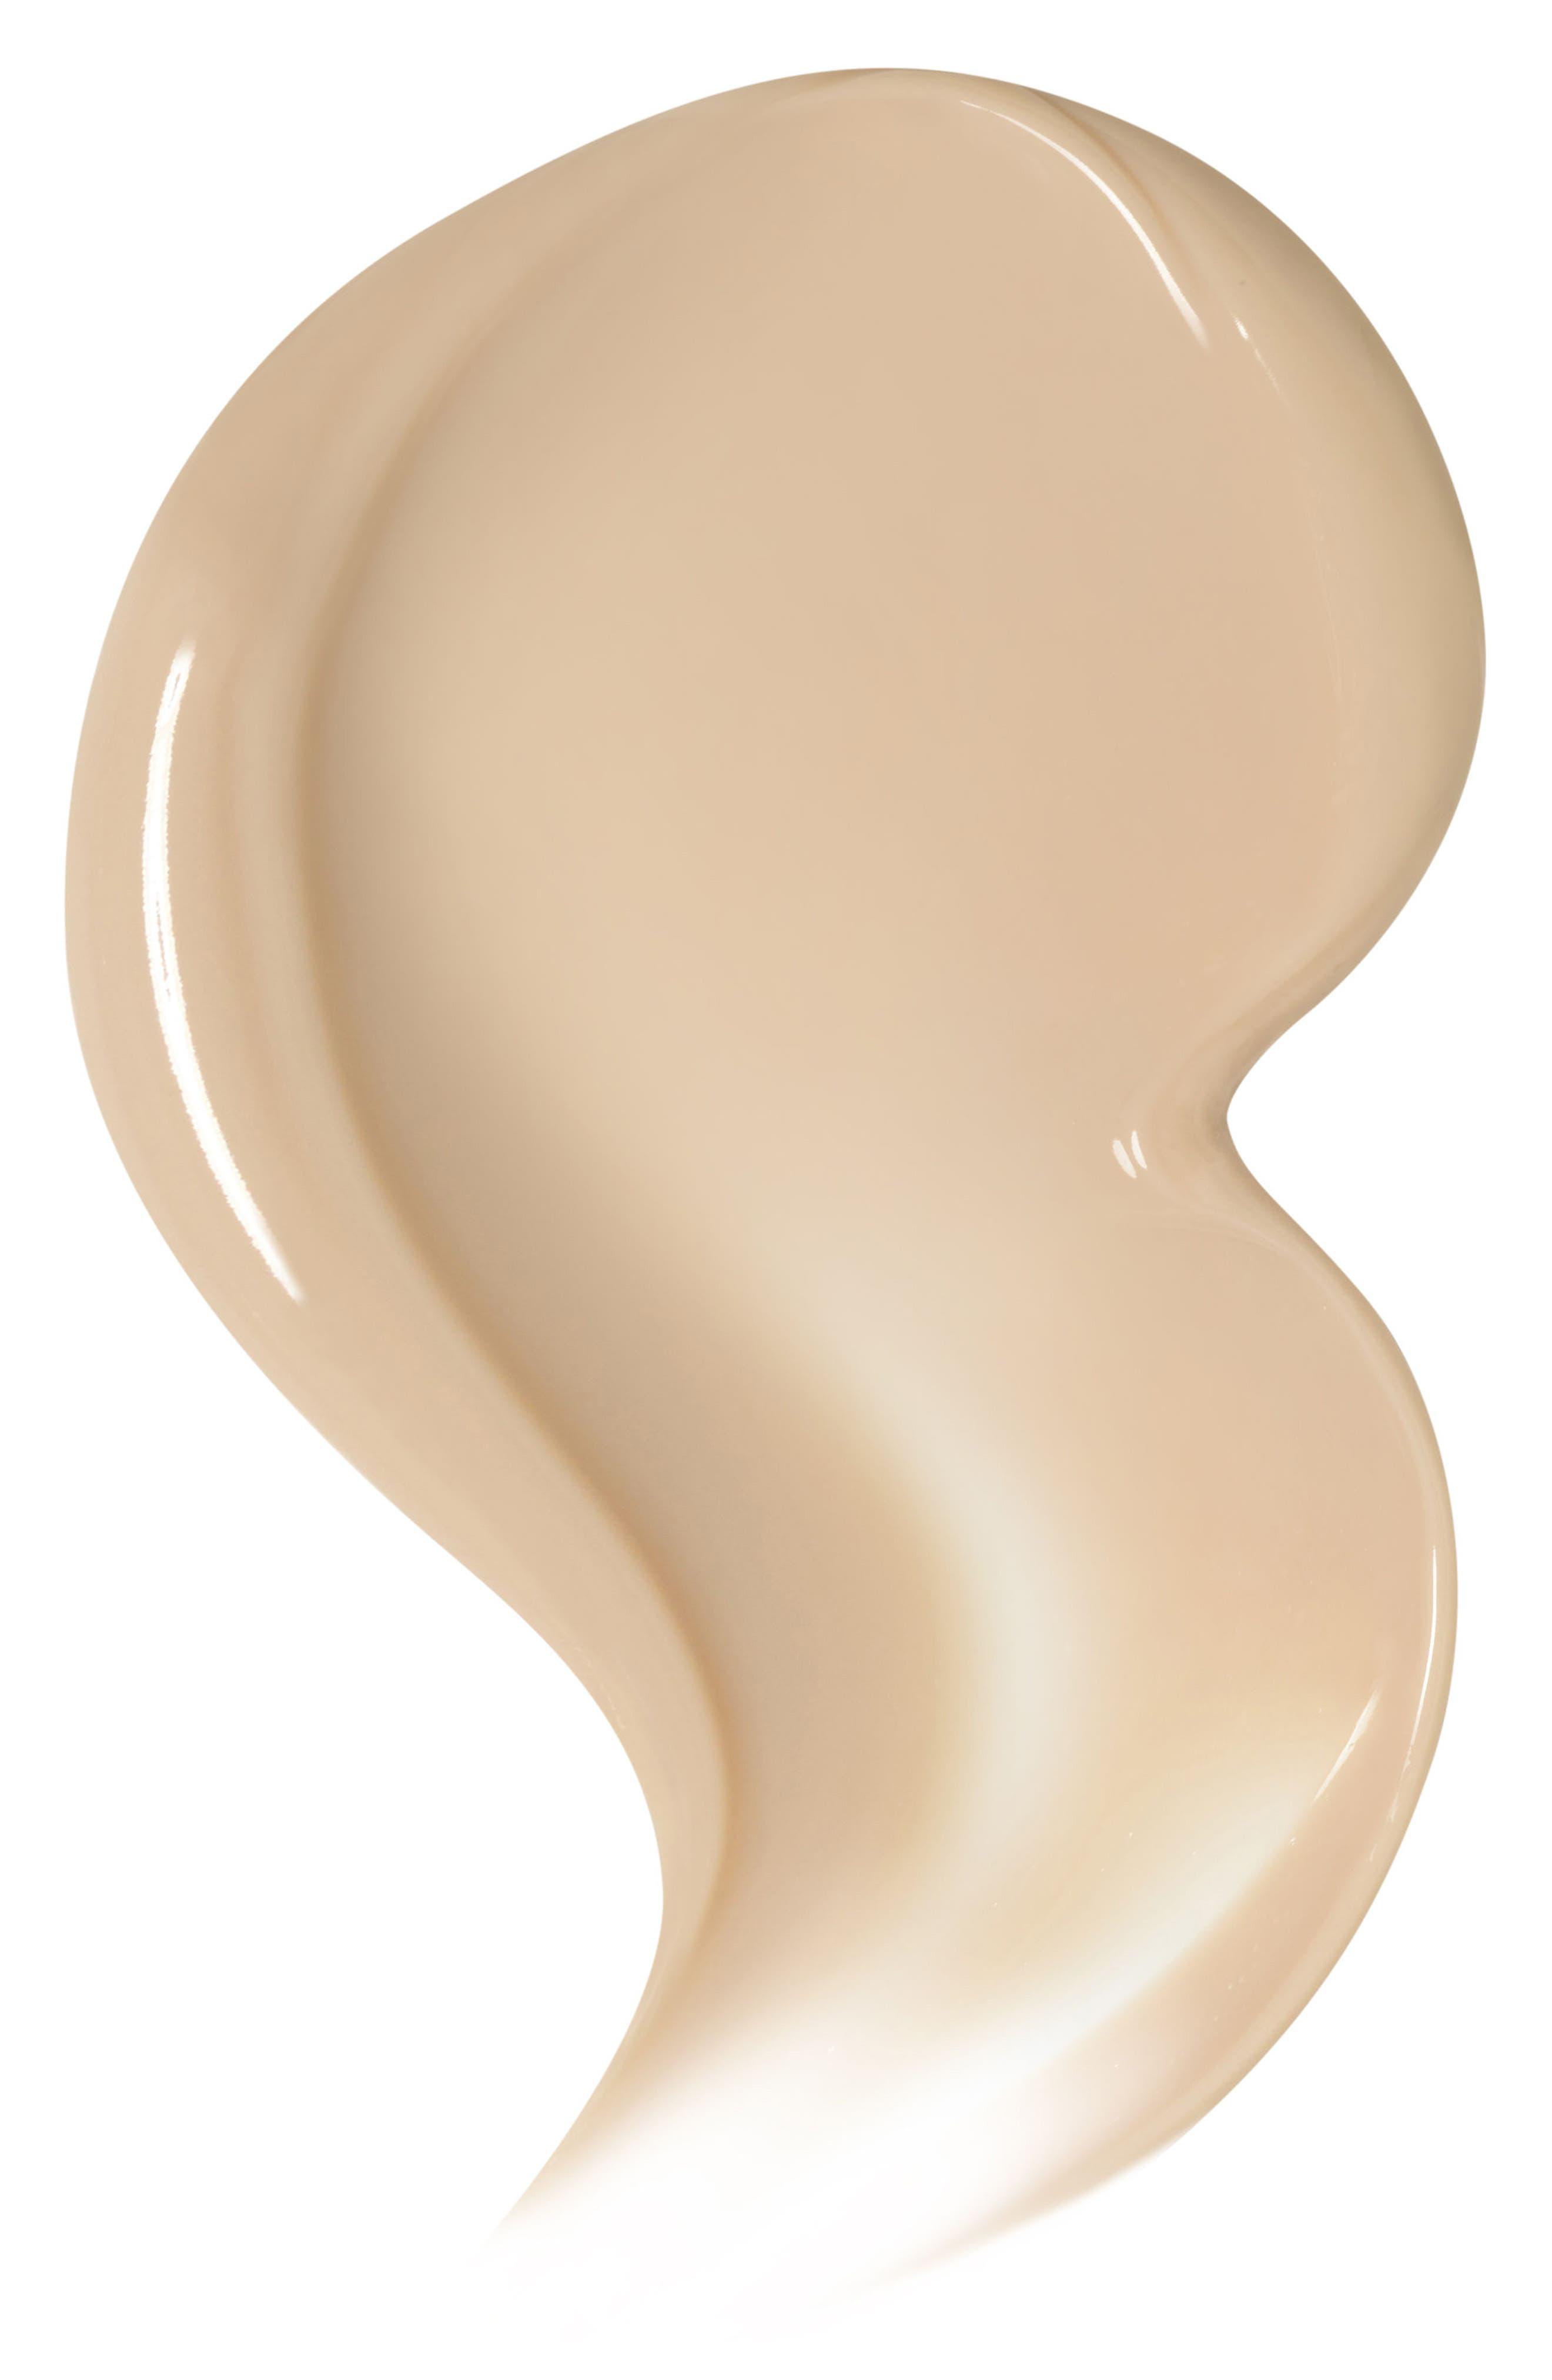 Alternate Image 3  - Sulwhasoo 'Timetreasure' Renovating Cream EX